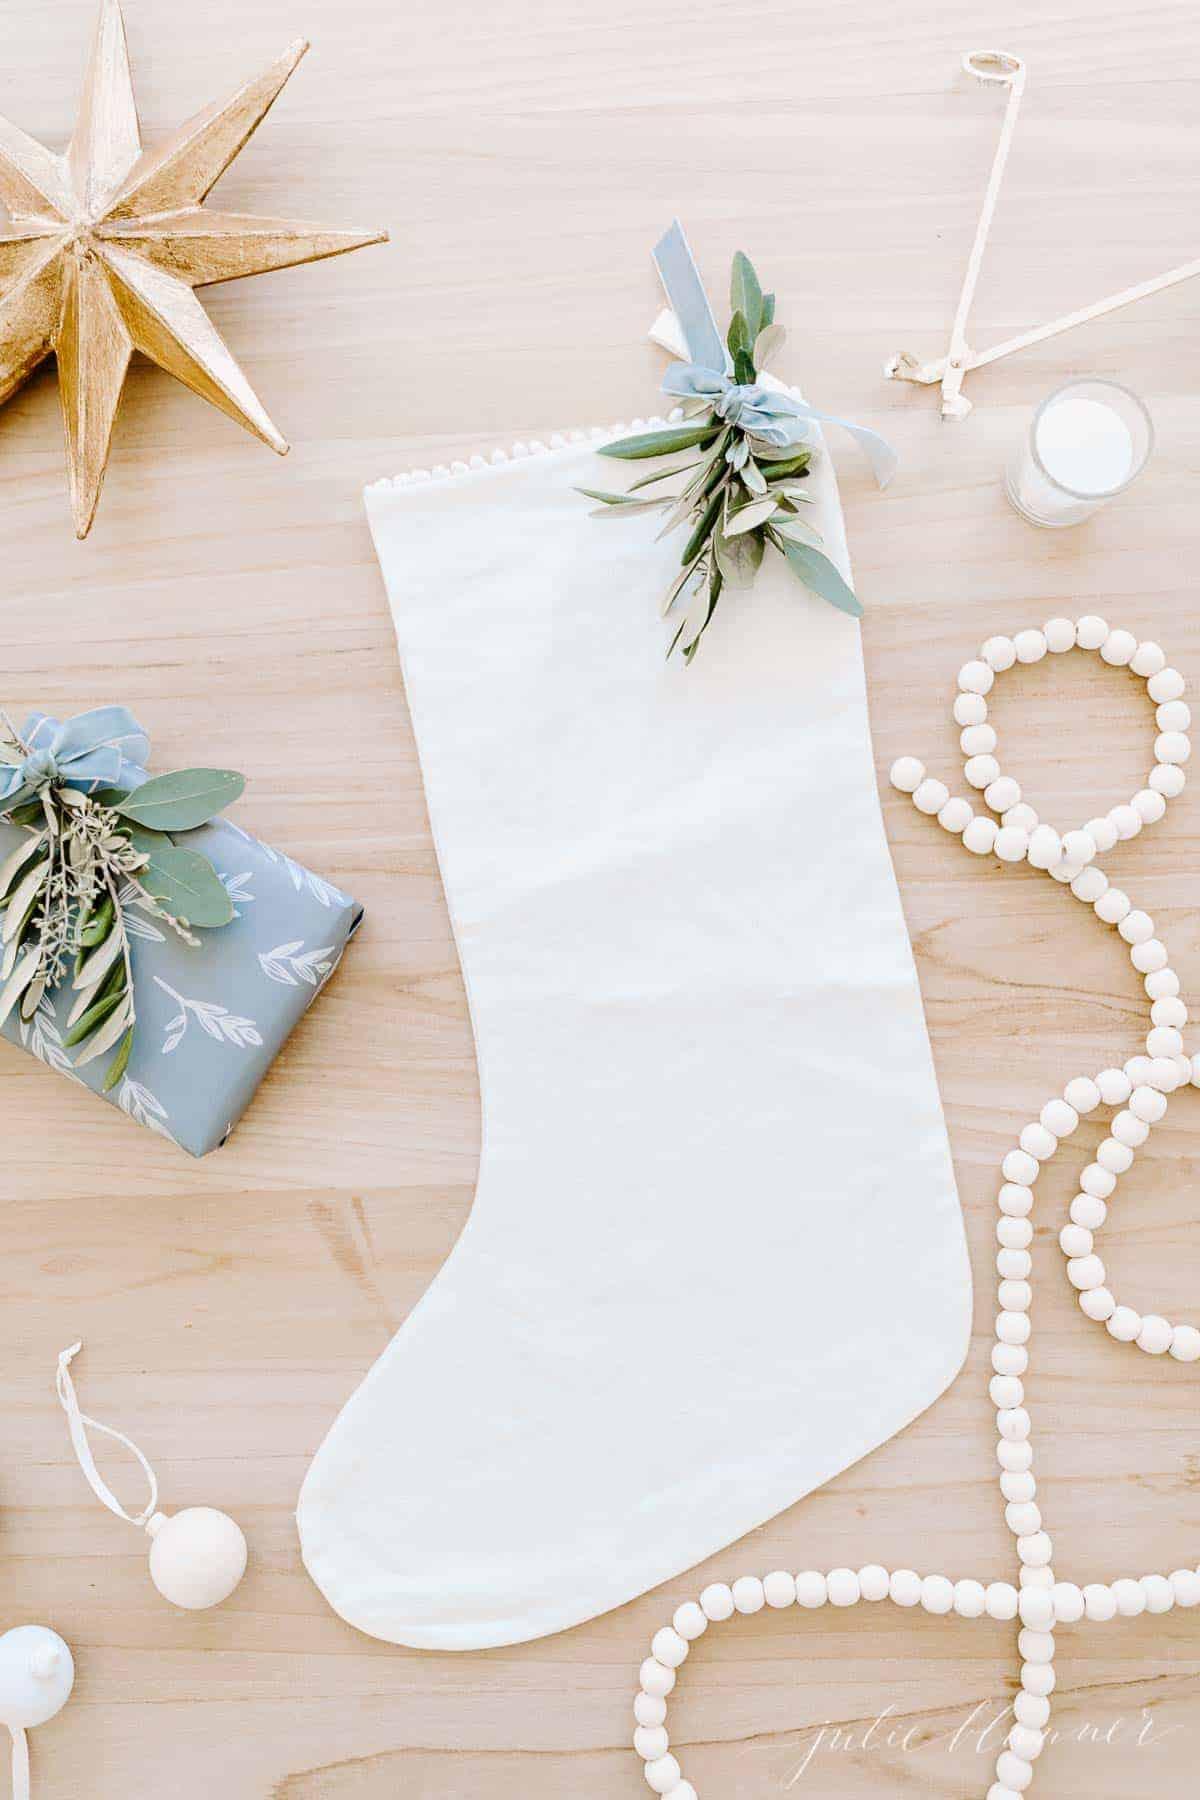 flat lay of star stocking garland gift and greenery